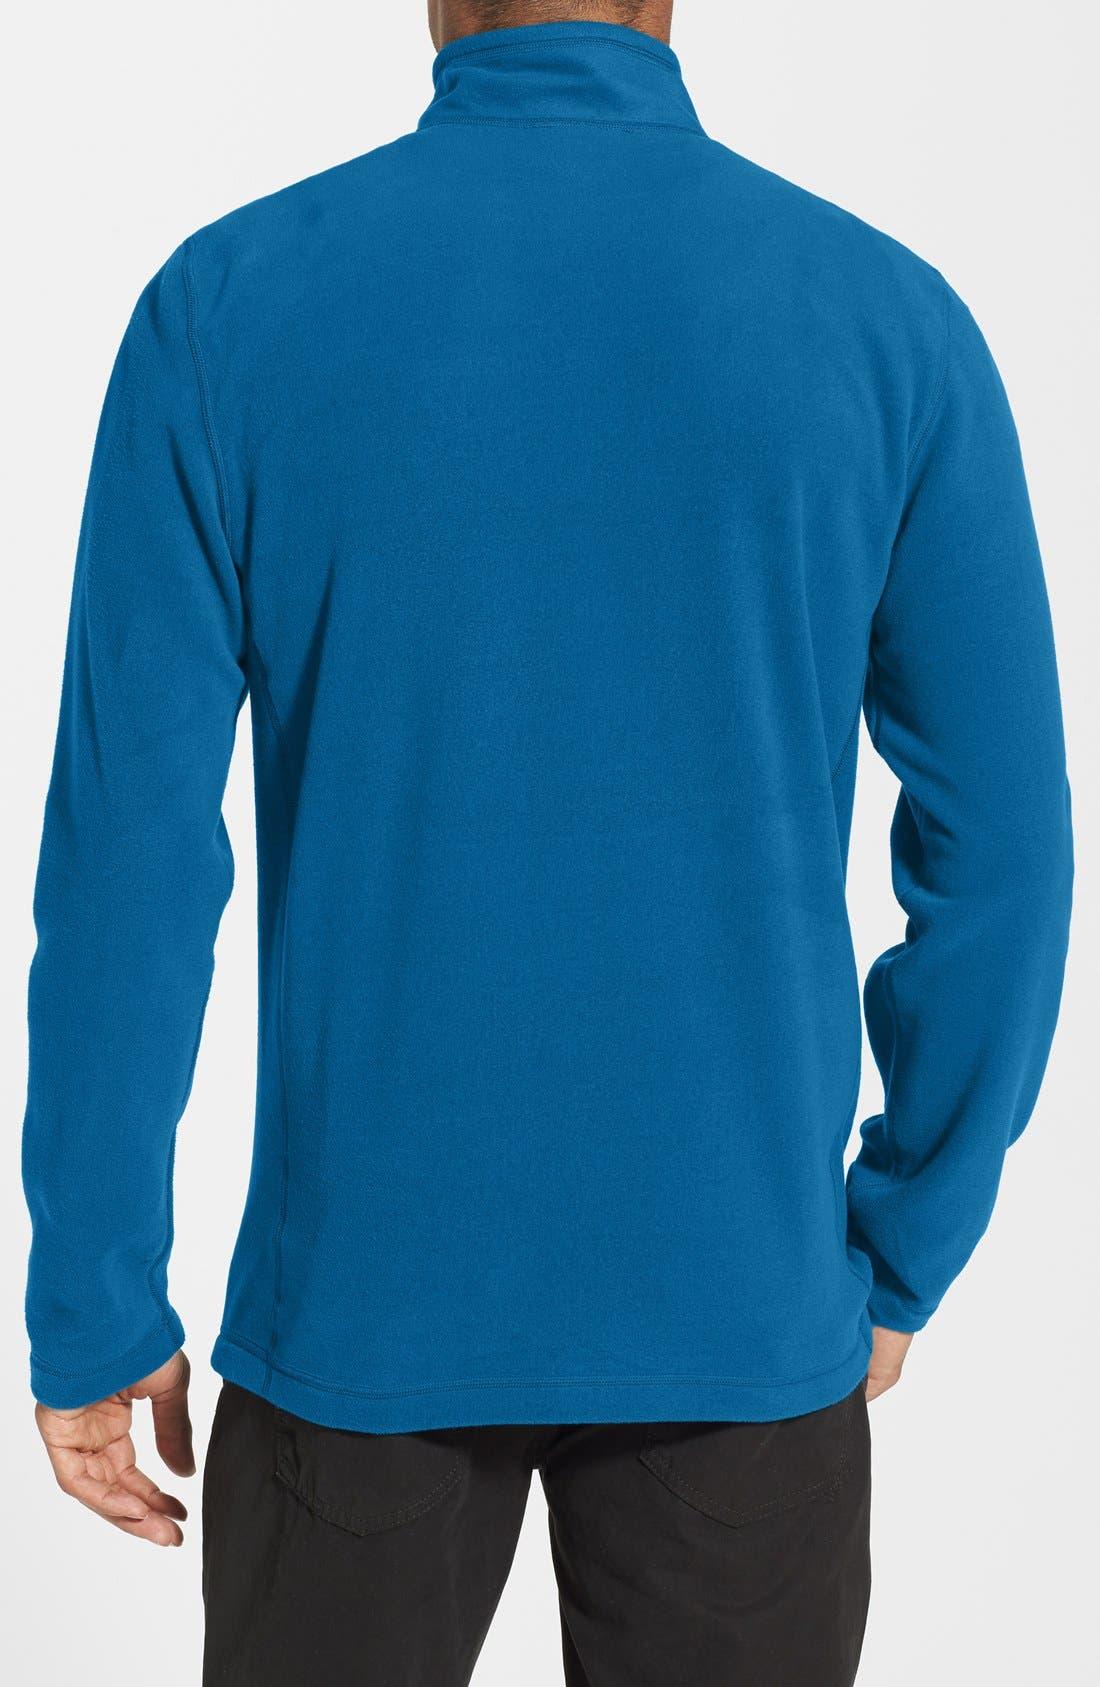 'TKA 100 Glacier' Quarter Zip Fleece Pullover,                             Alternate thumbnail 53, color,